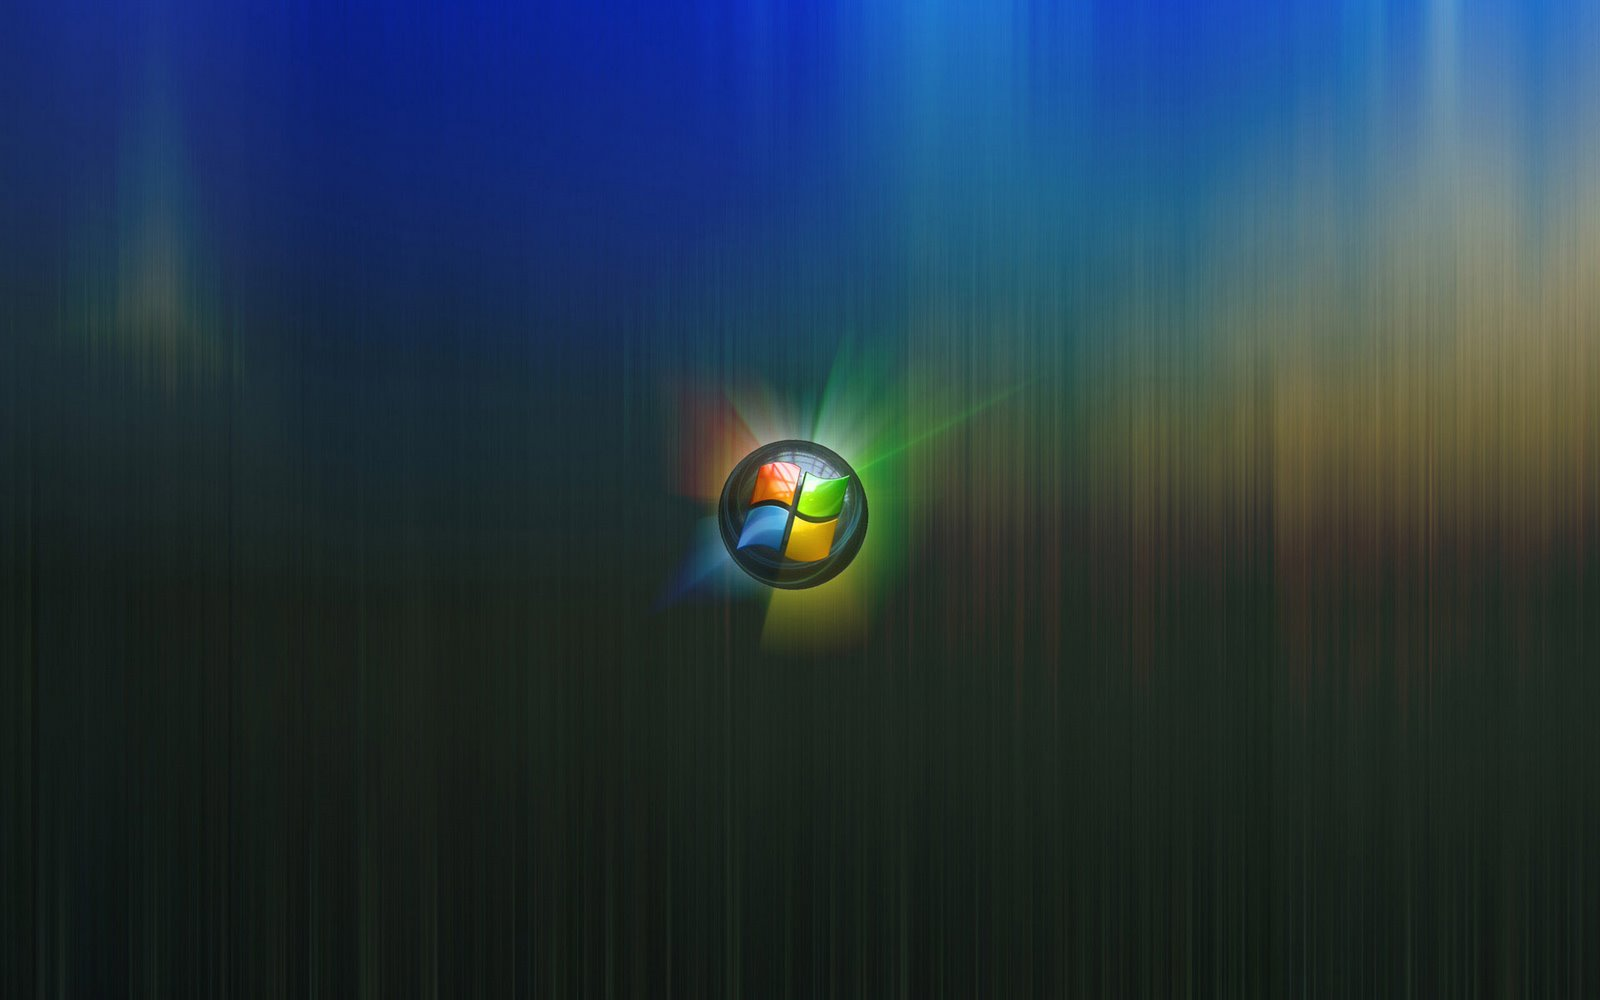 windows 7 wallpaper hd,blue,light,water,sky,operating system